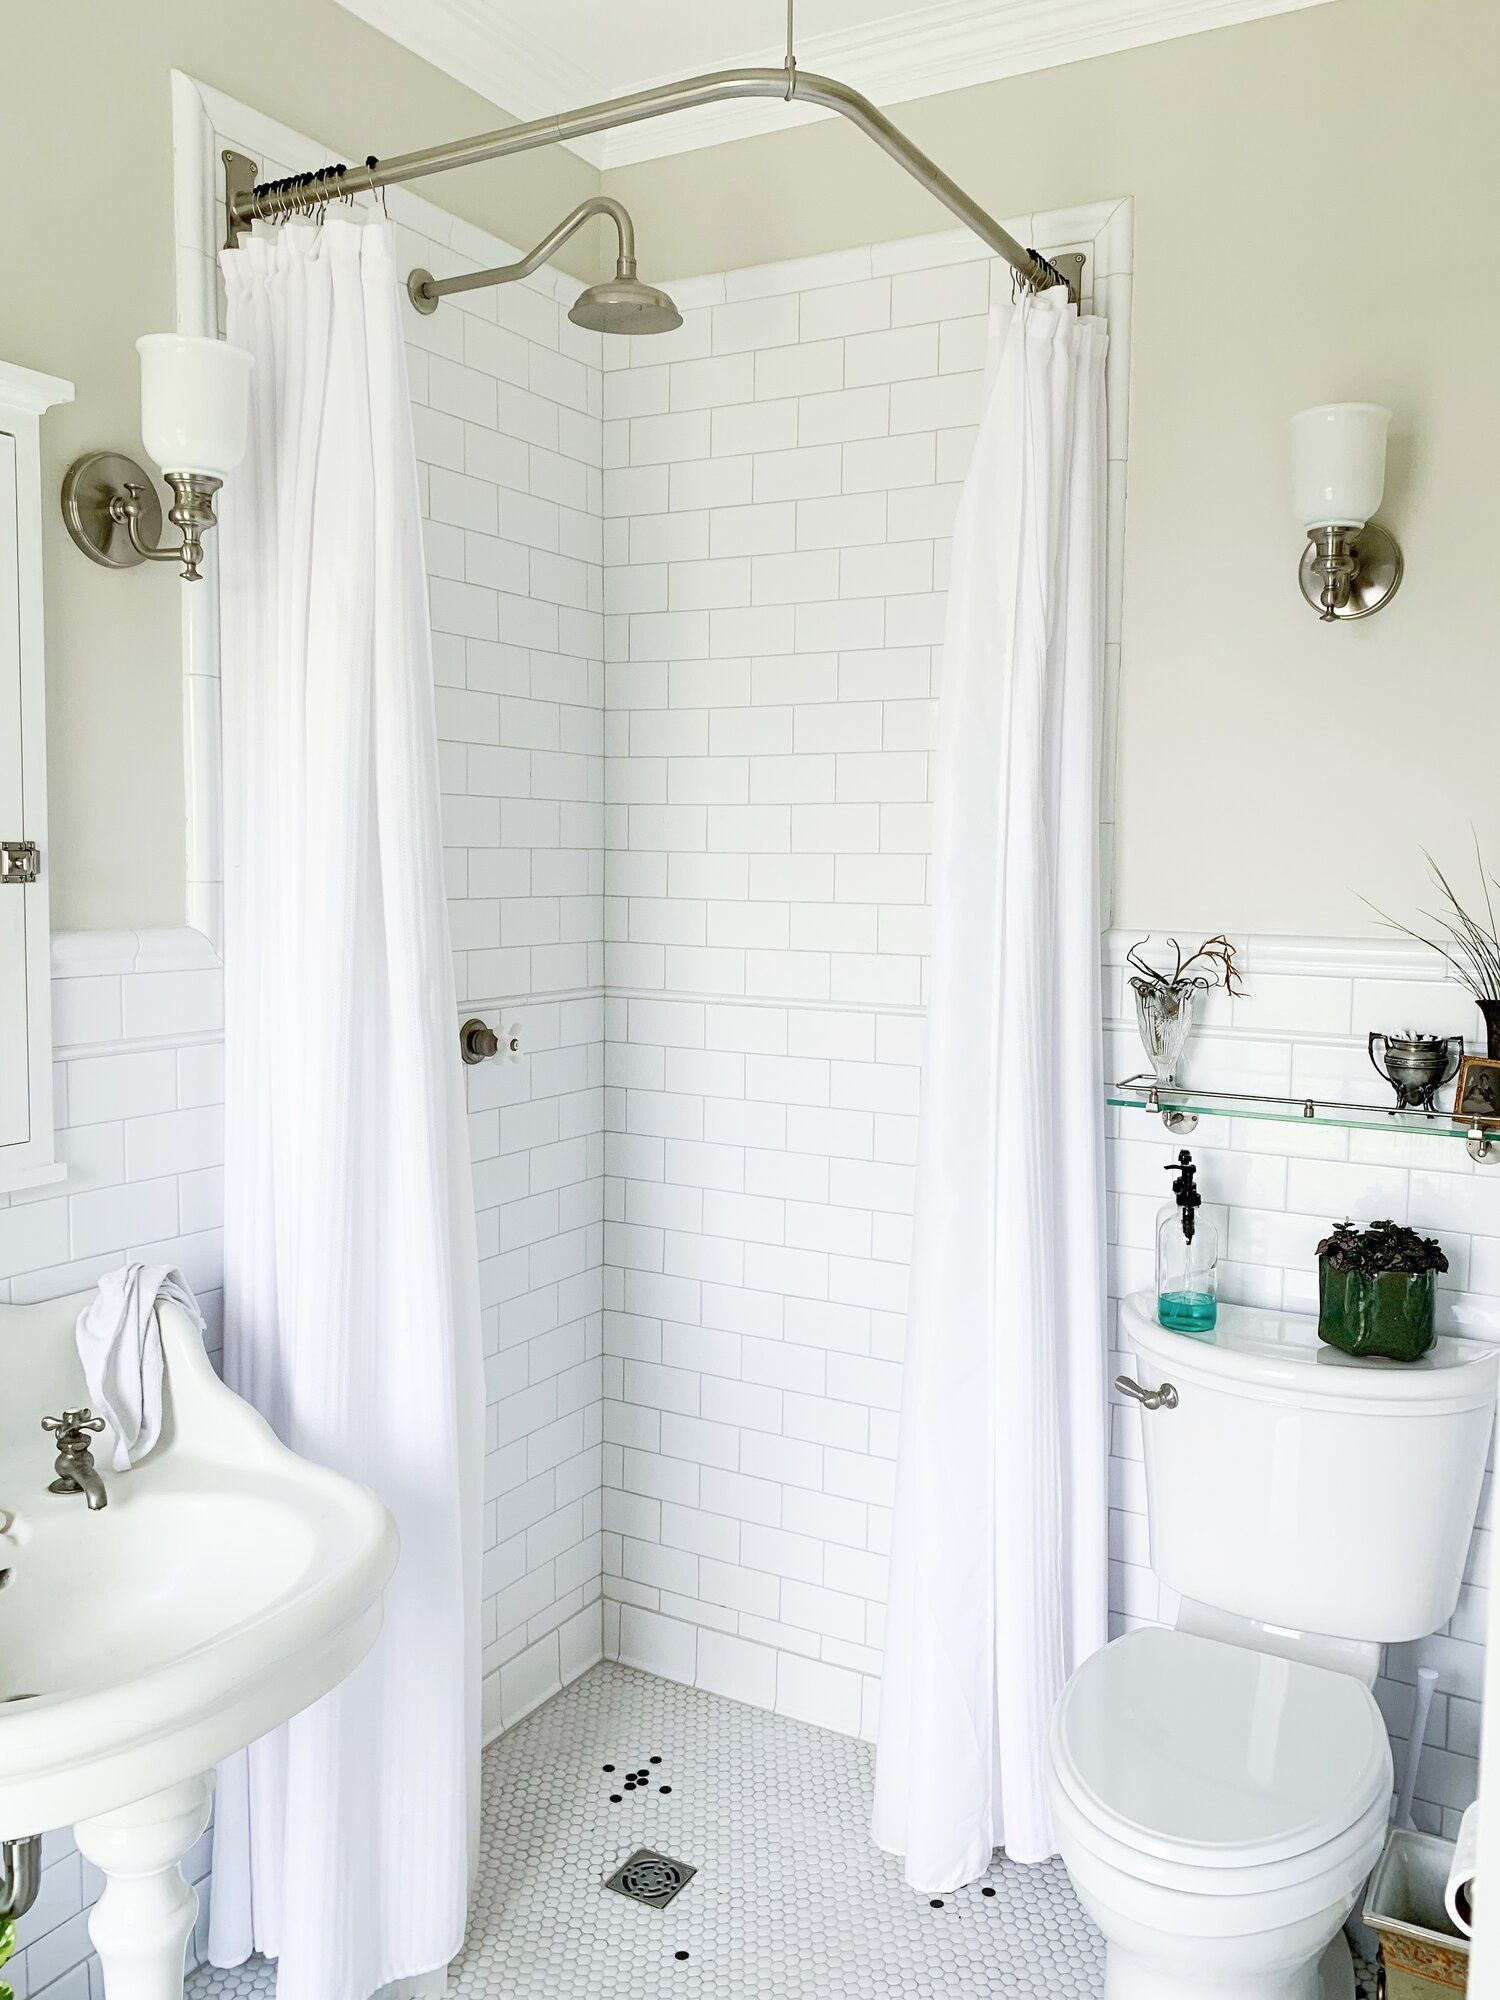 Shower Head Shower Handles Shower Curtain Rod Shower Curtain